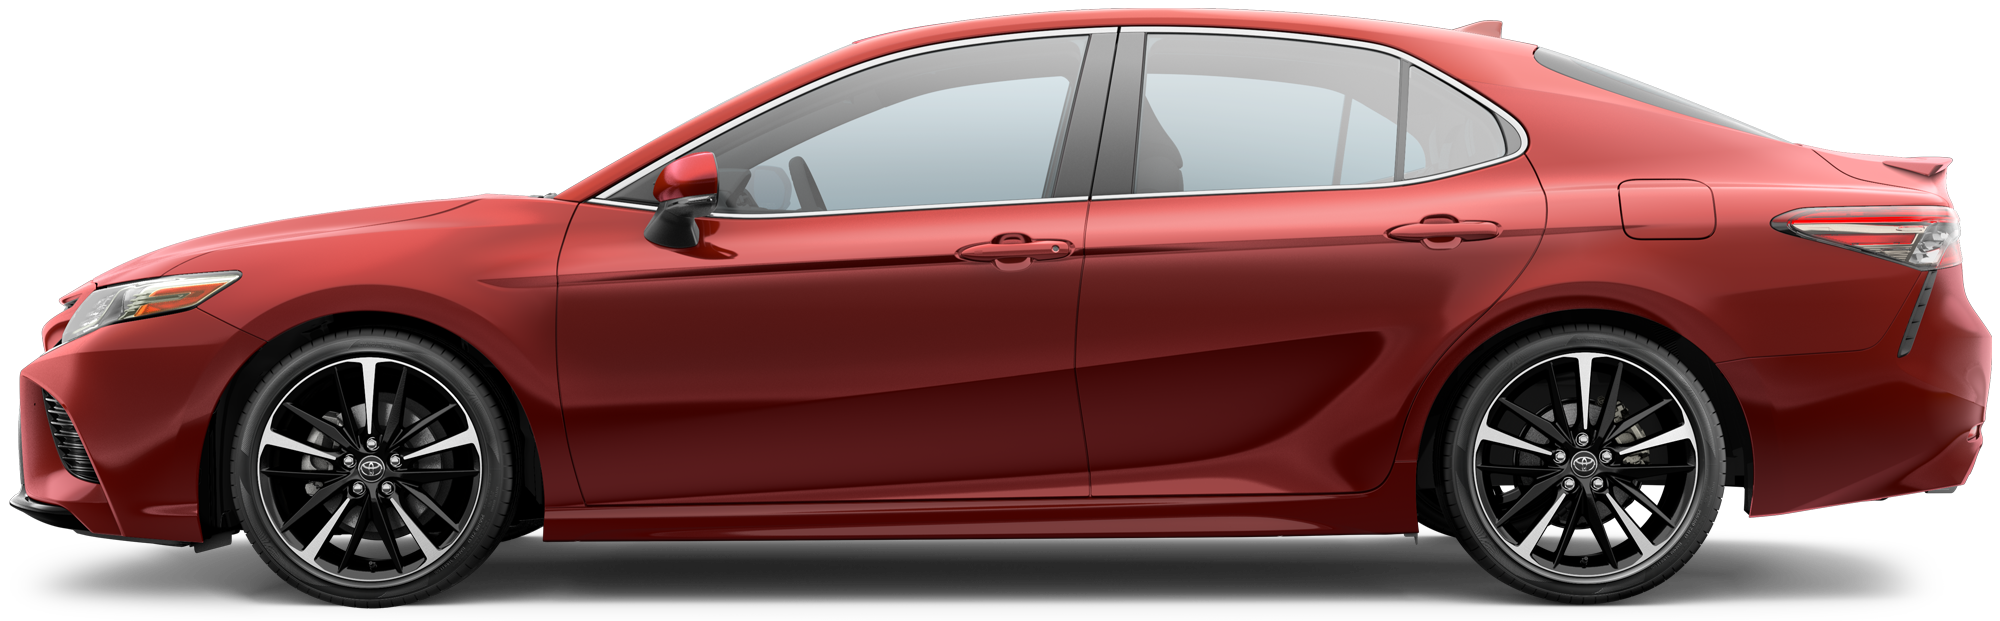 2019 Toyota Camry Sedan L